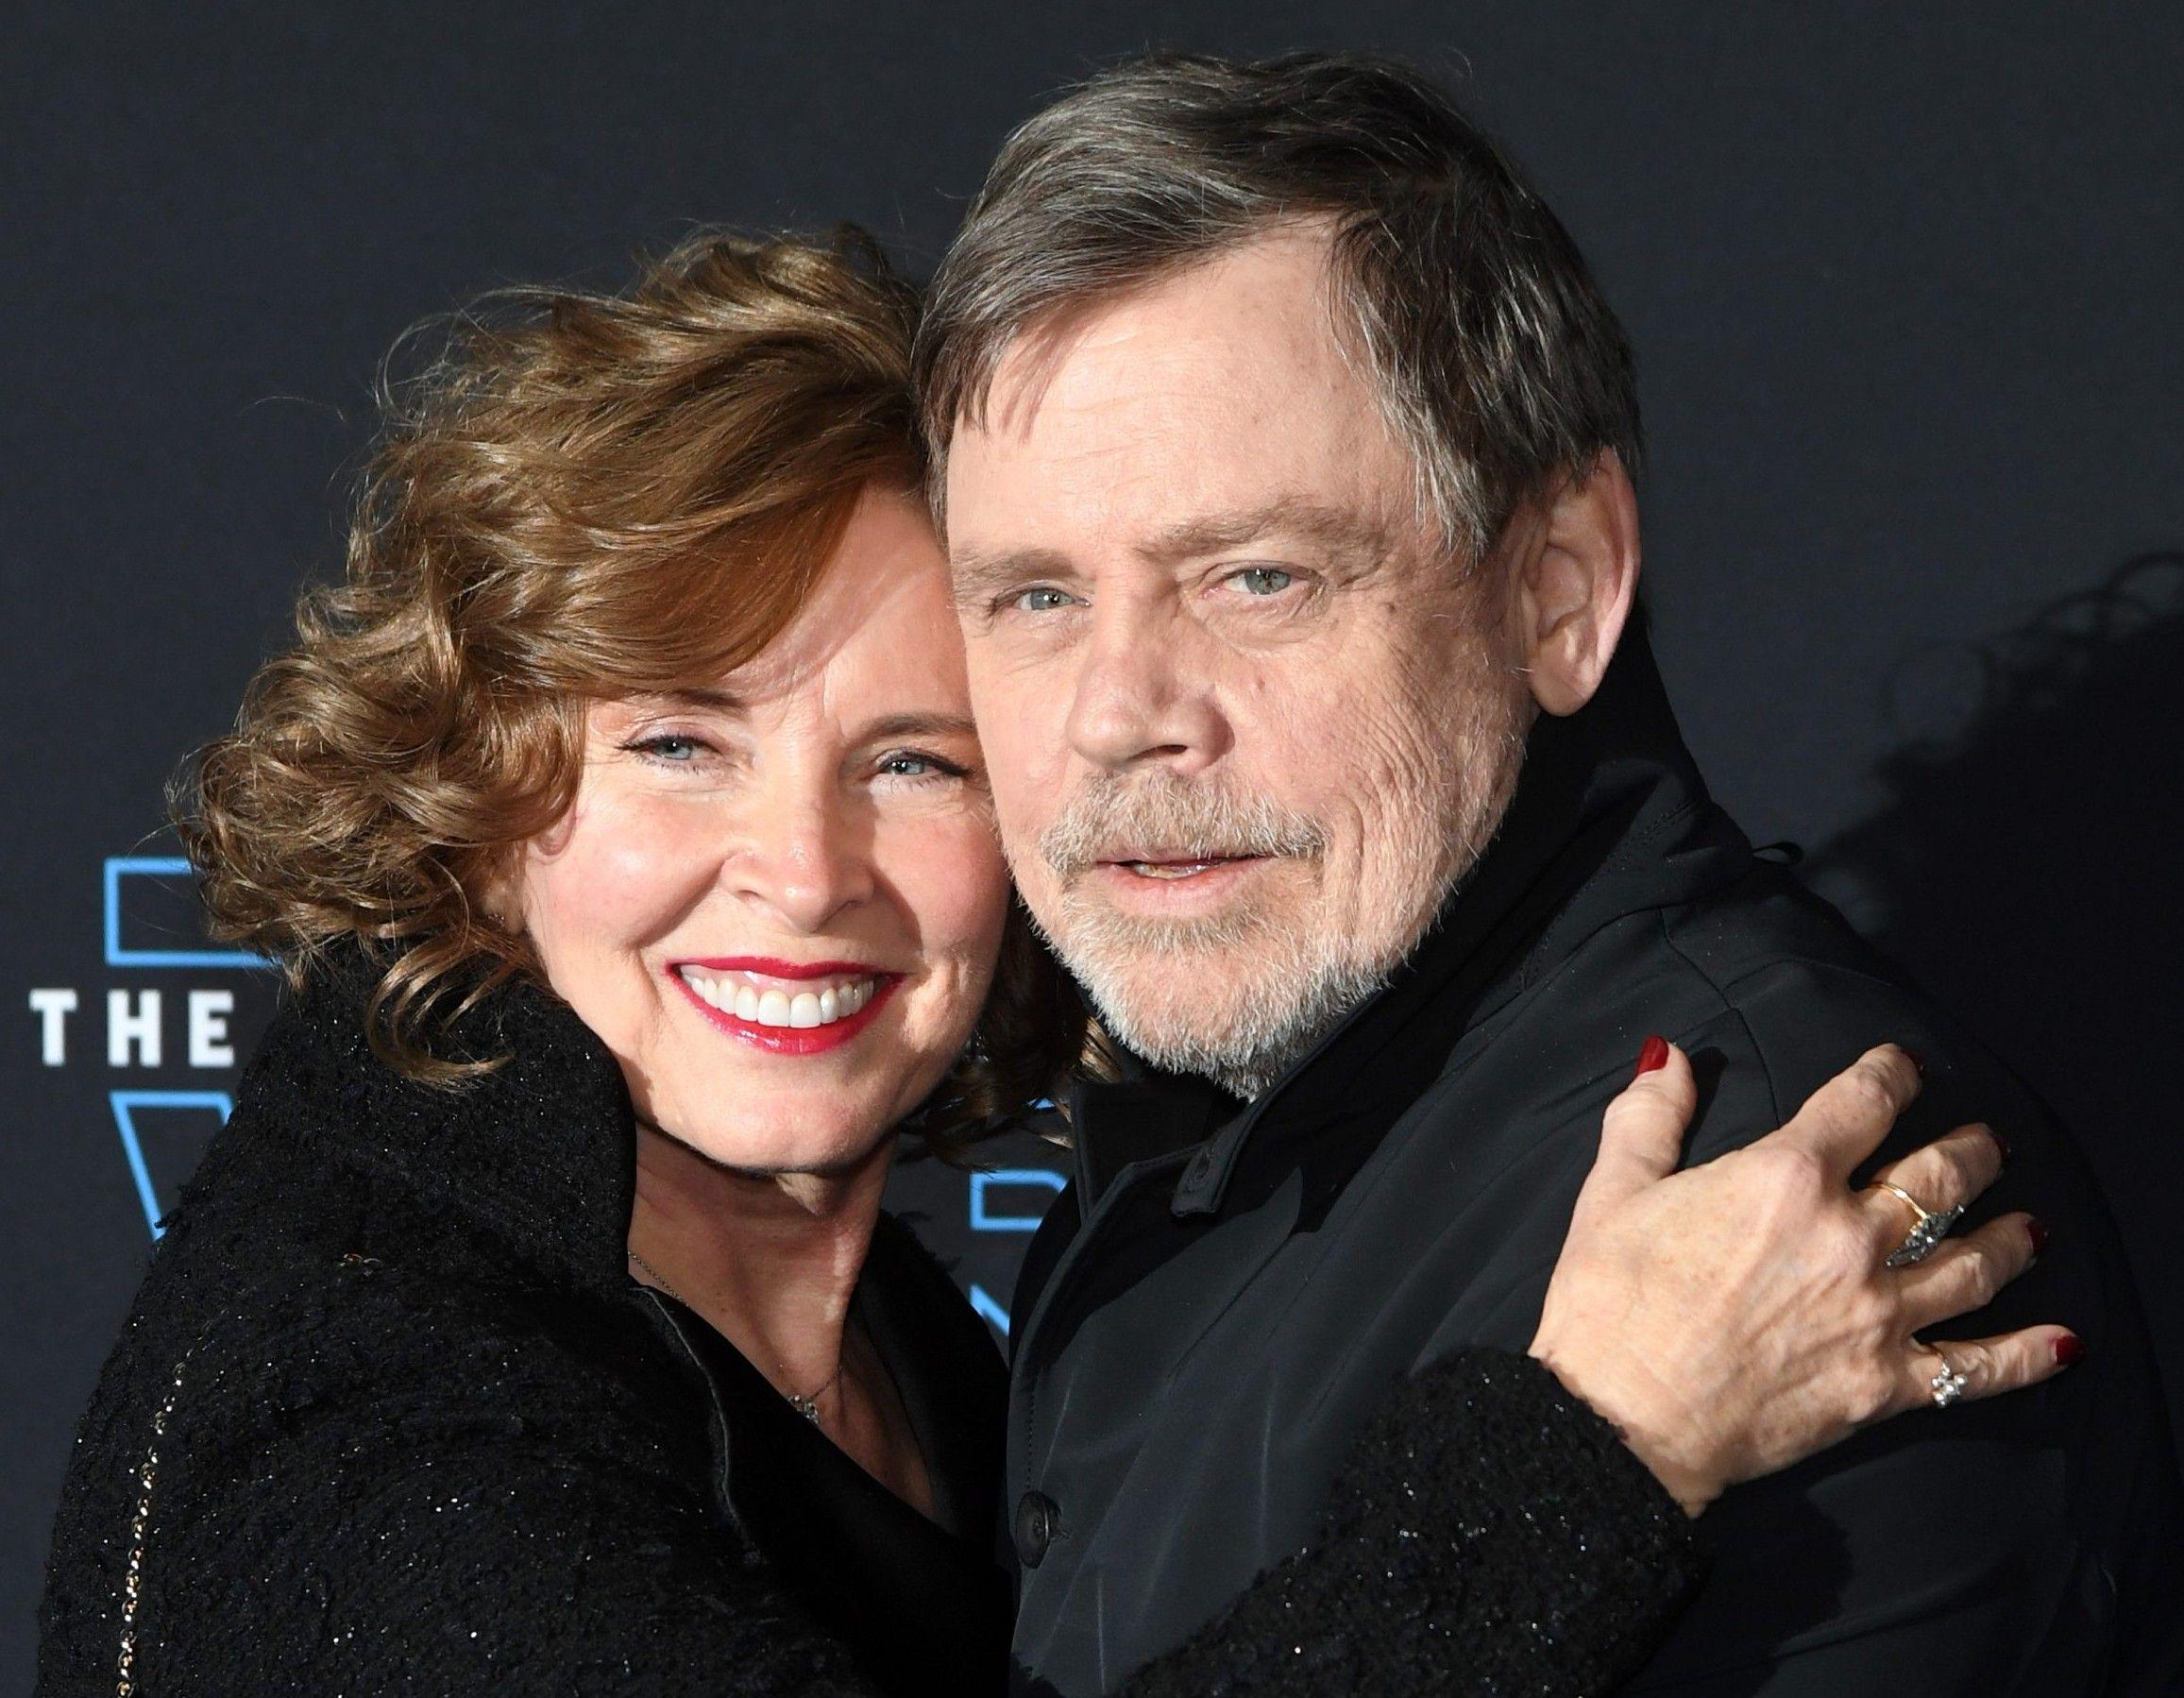 Mark Hamill S Wife Marilou York Wiki Parents Net Worth Married Life Kids Education In 2021 Mark Hamill Star Wars Movie Chelsea Hamill